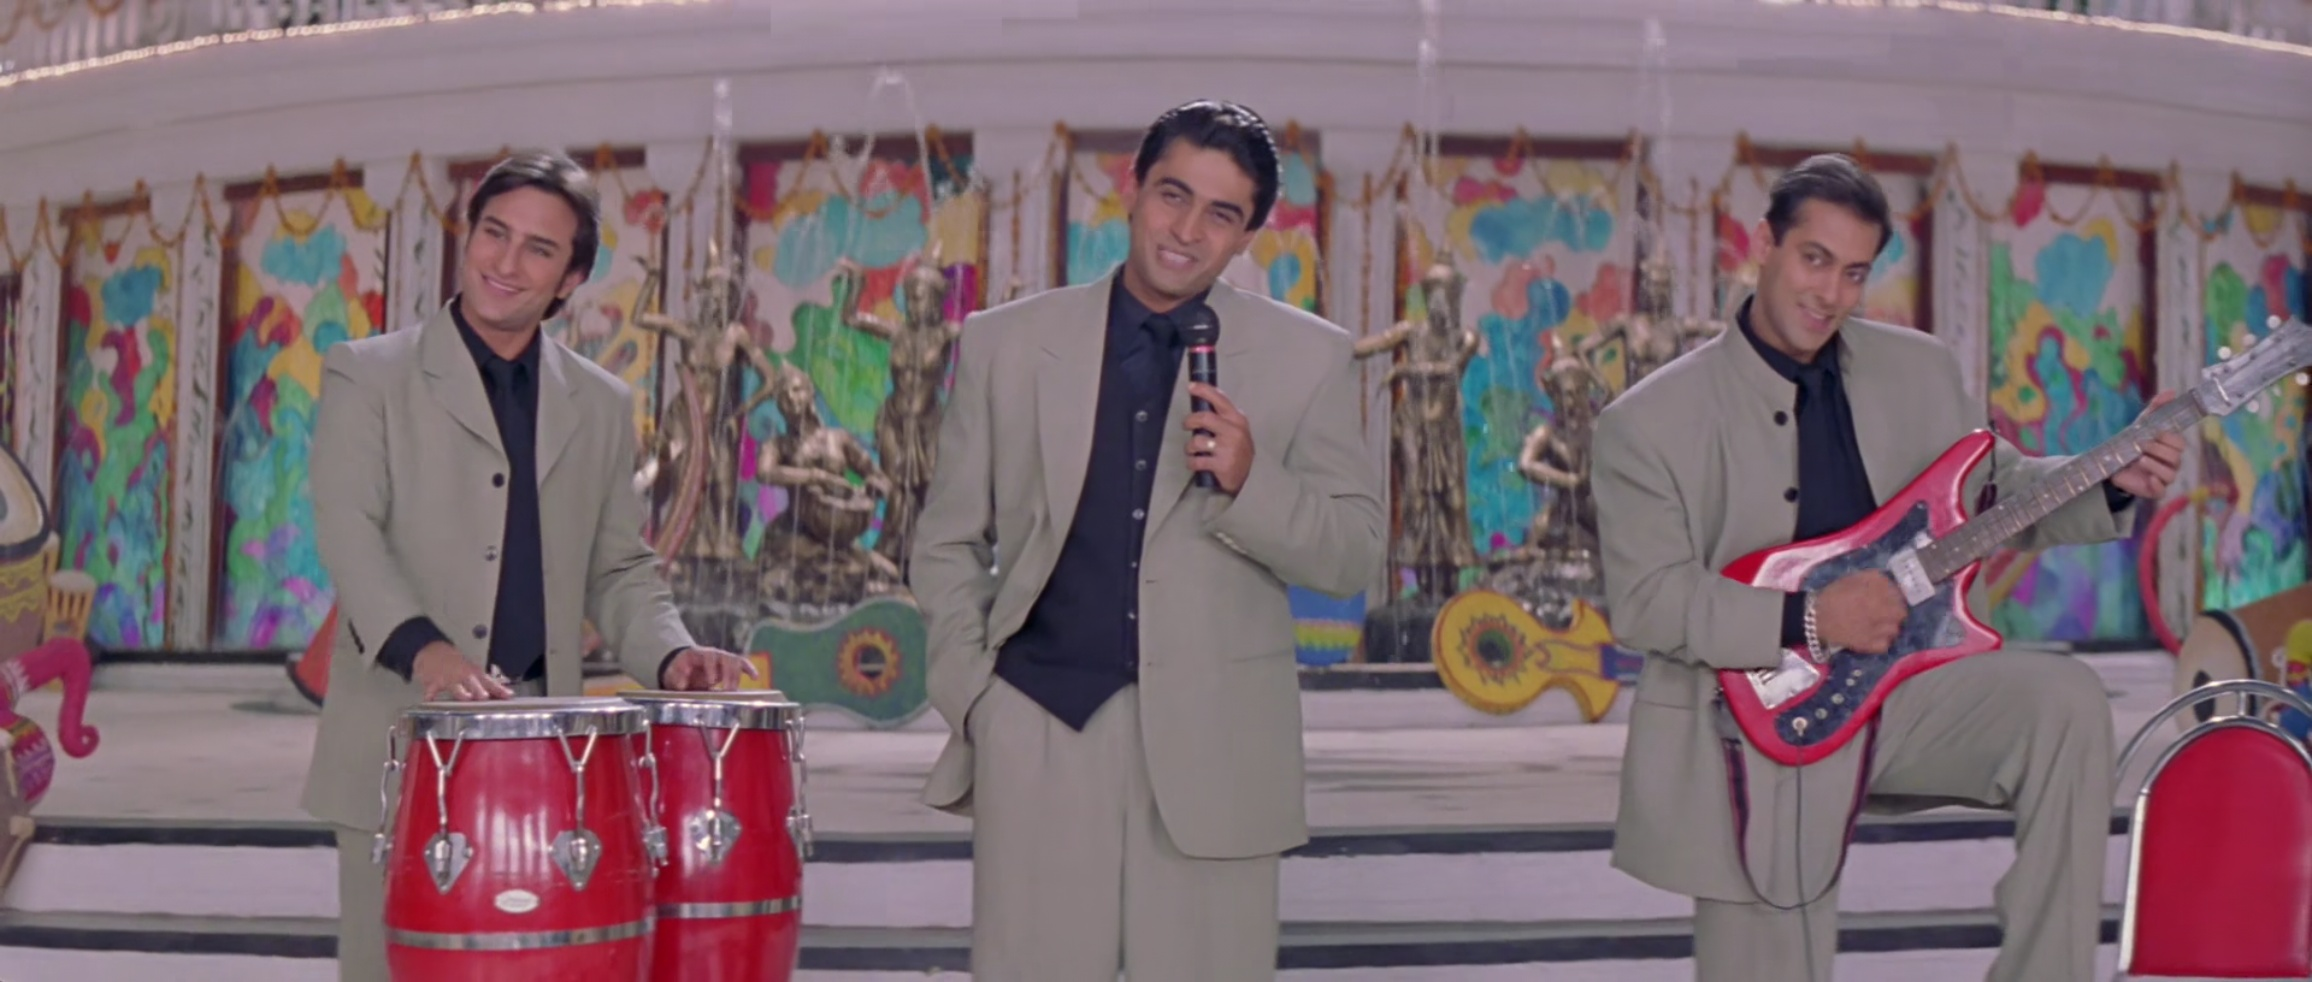 Salman Khan, Mohnish Bahl, and Saif Ali Khan in Hum Saath-Saath Hain (1999)